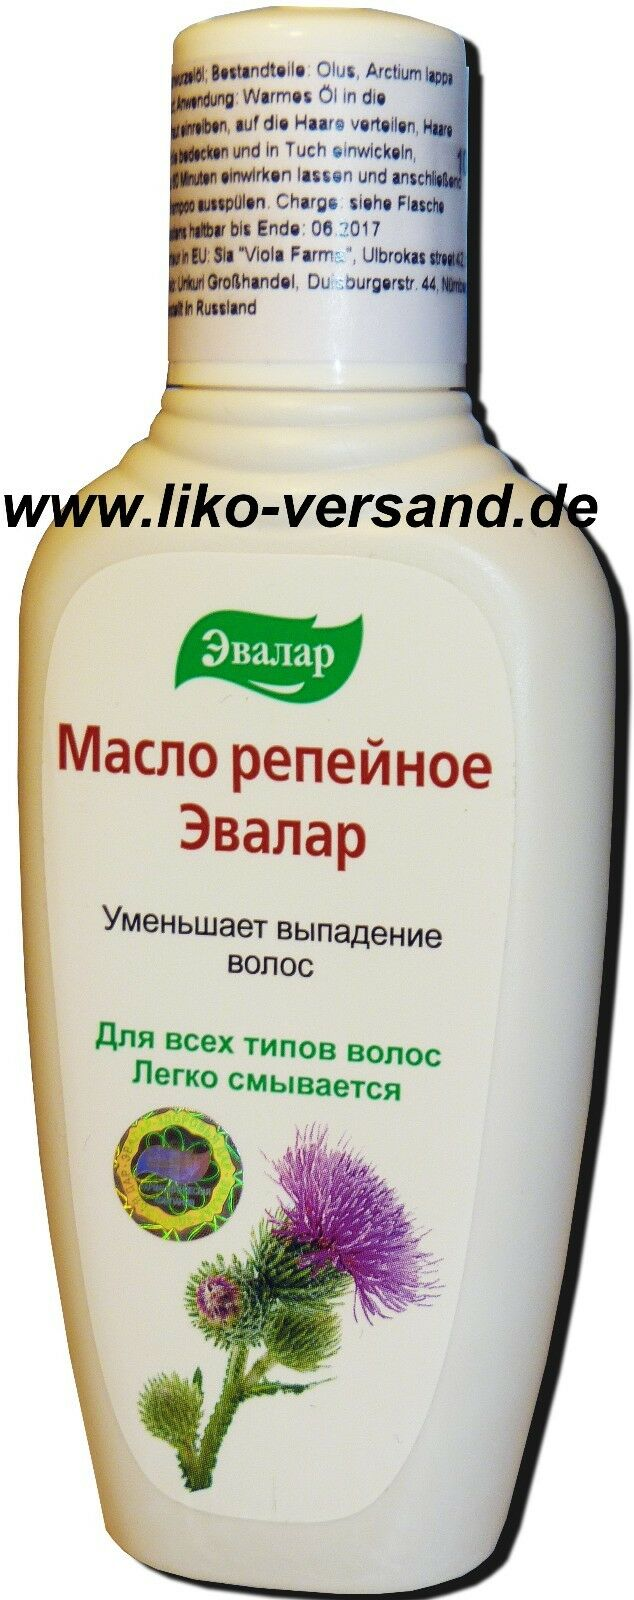 Klettenwurzelöl Haaröl репейное масло 100 300 500 1000 ml versandfrei